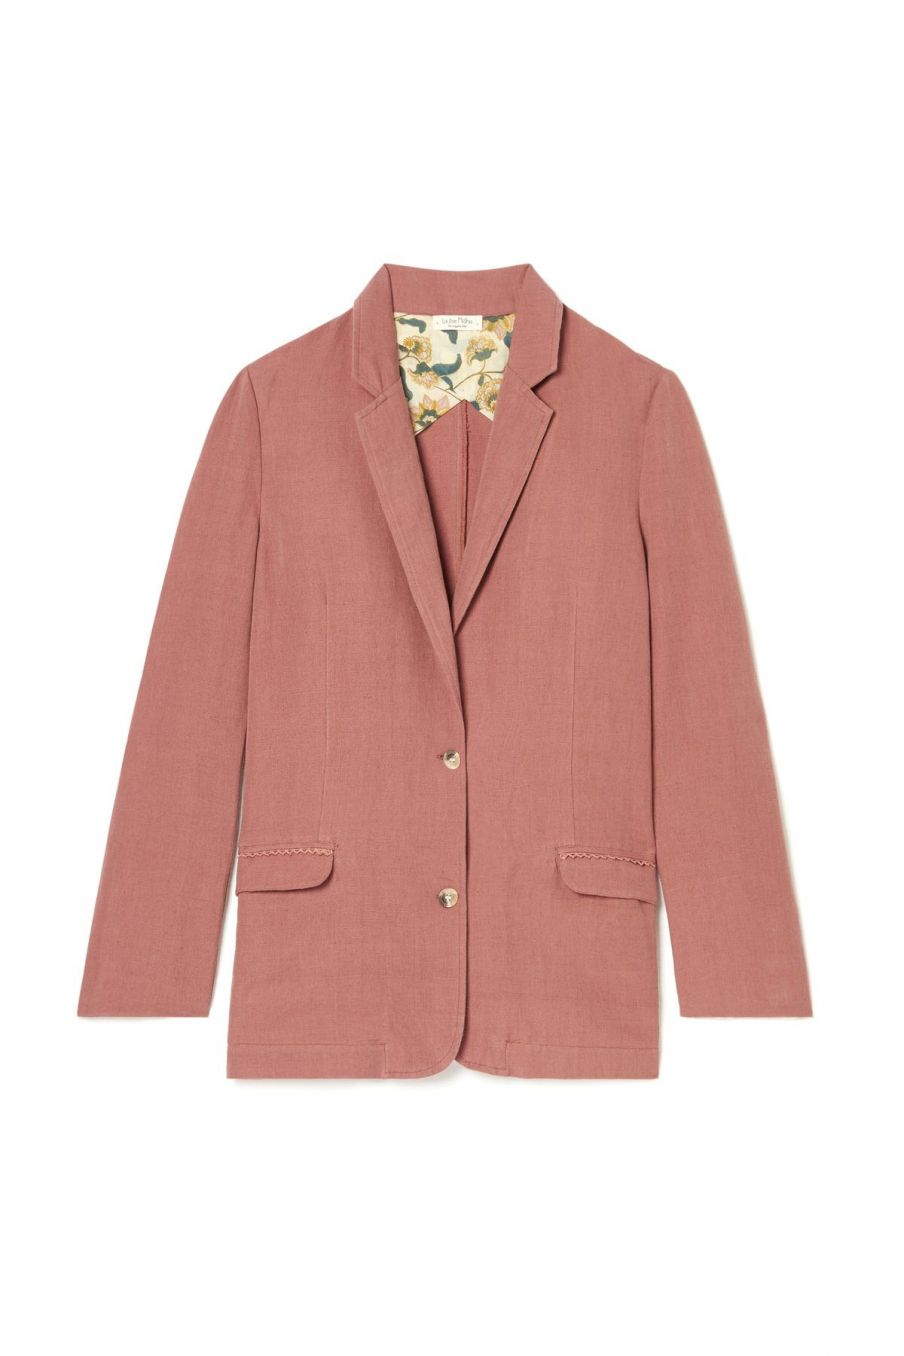 boheme chic vintage veste femme anzou terracota